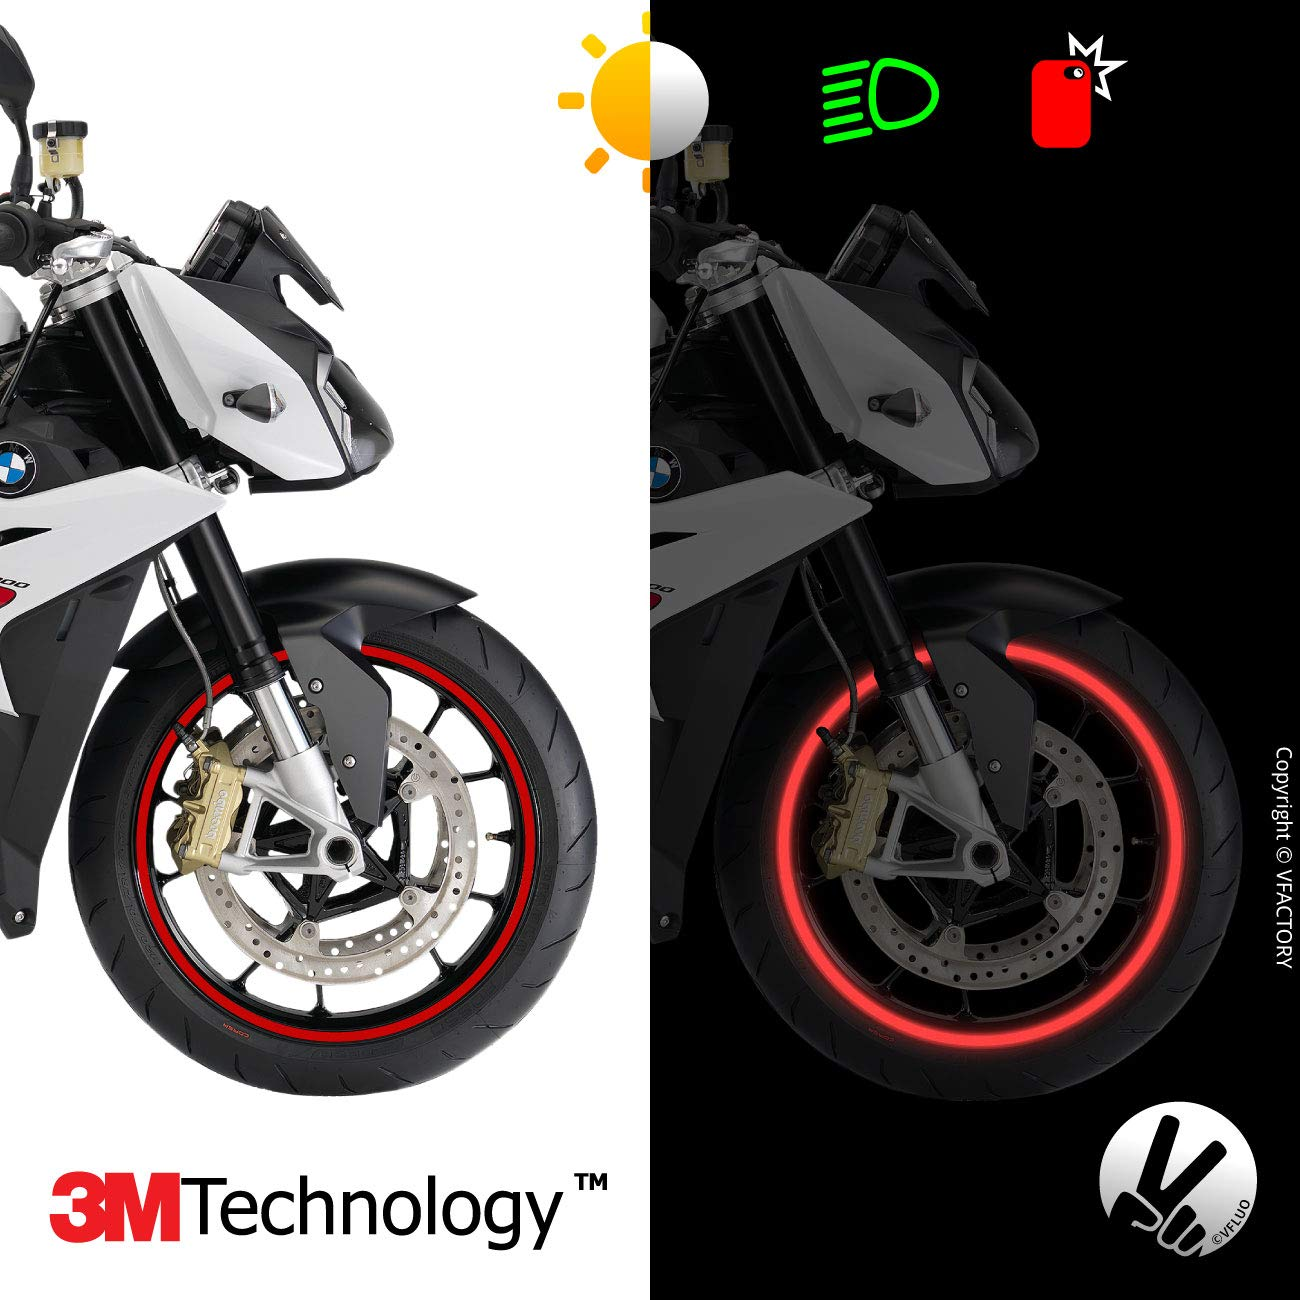 3M Technology/™ VFLUO CIRCULAR/™ 7 mm width Black motorcycle retro reflective wheel stripes kit 1 wheel